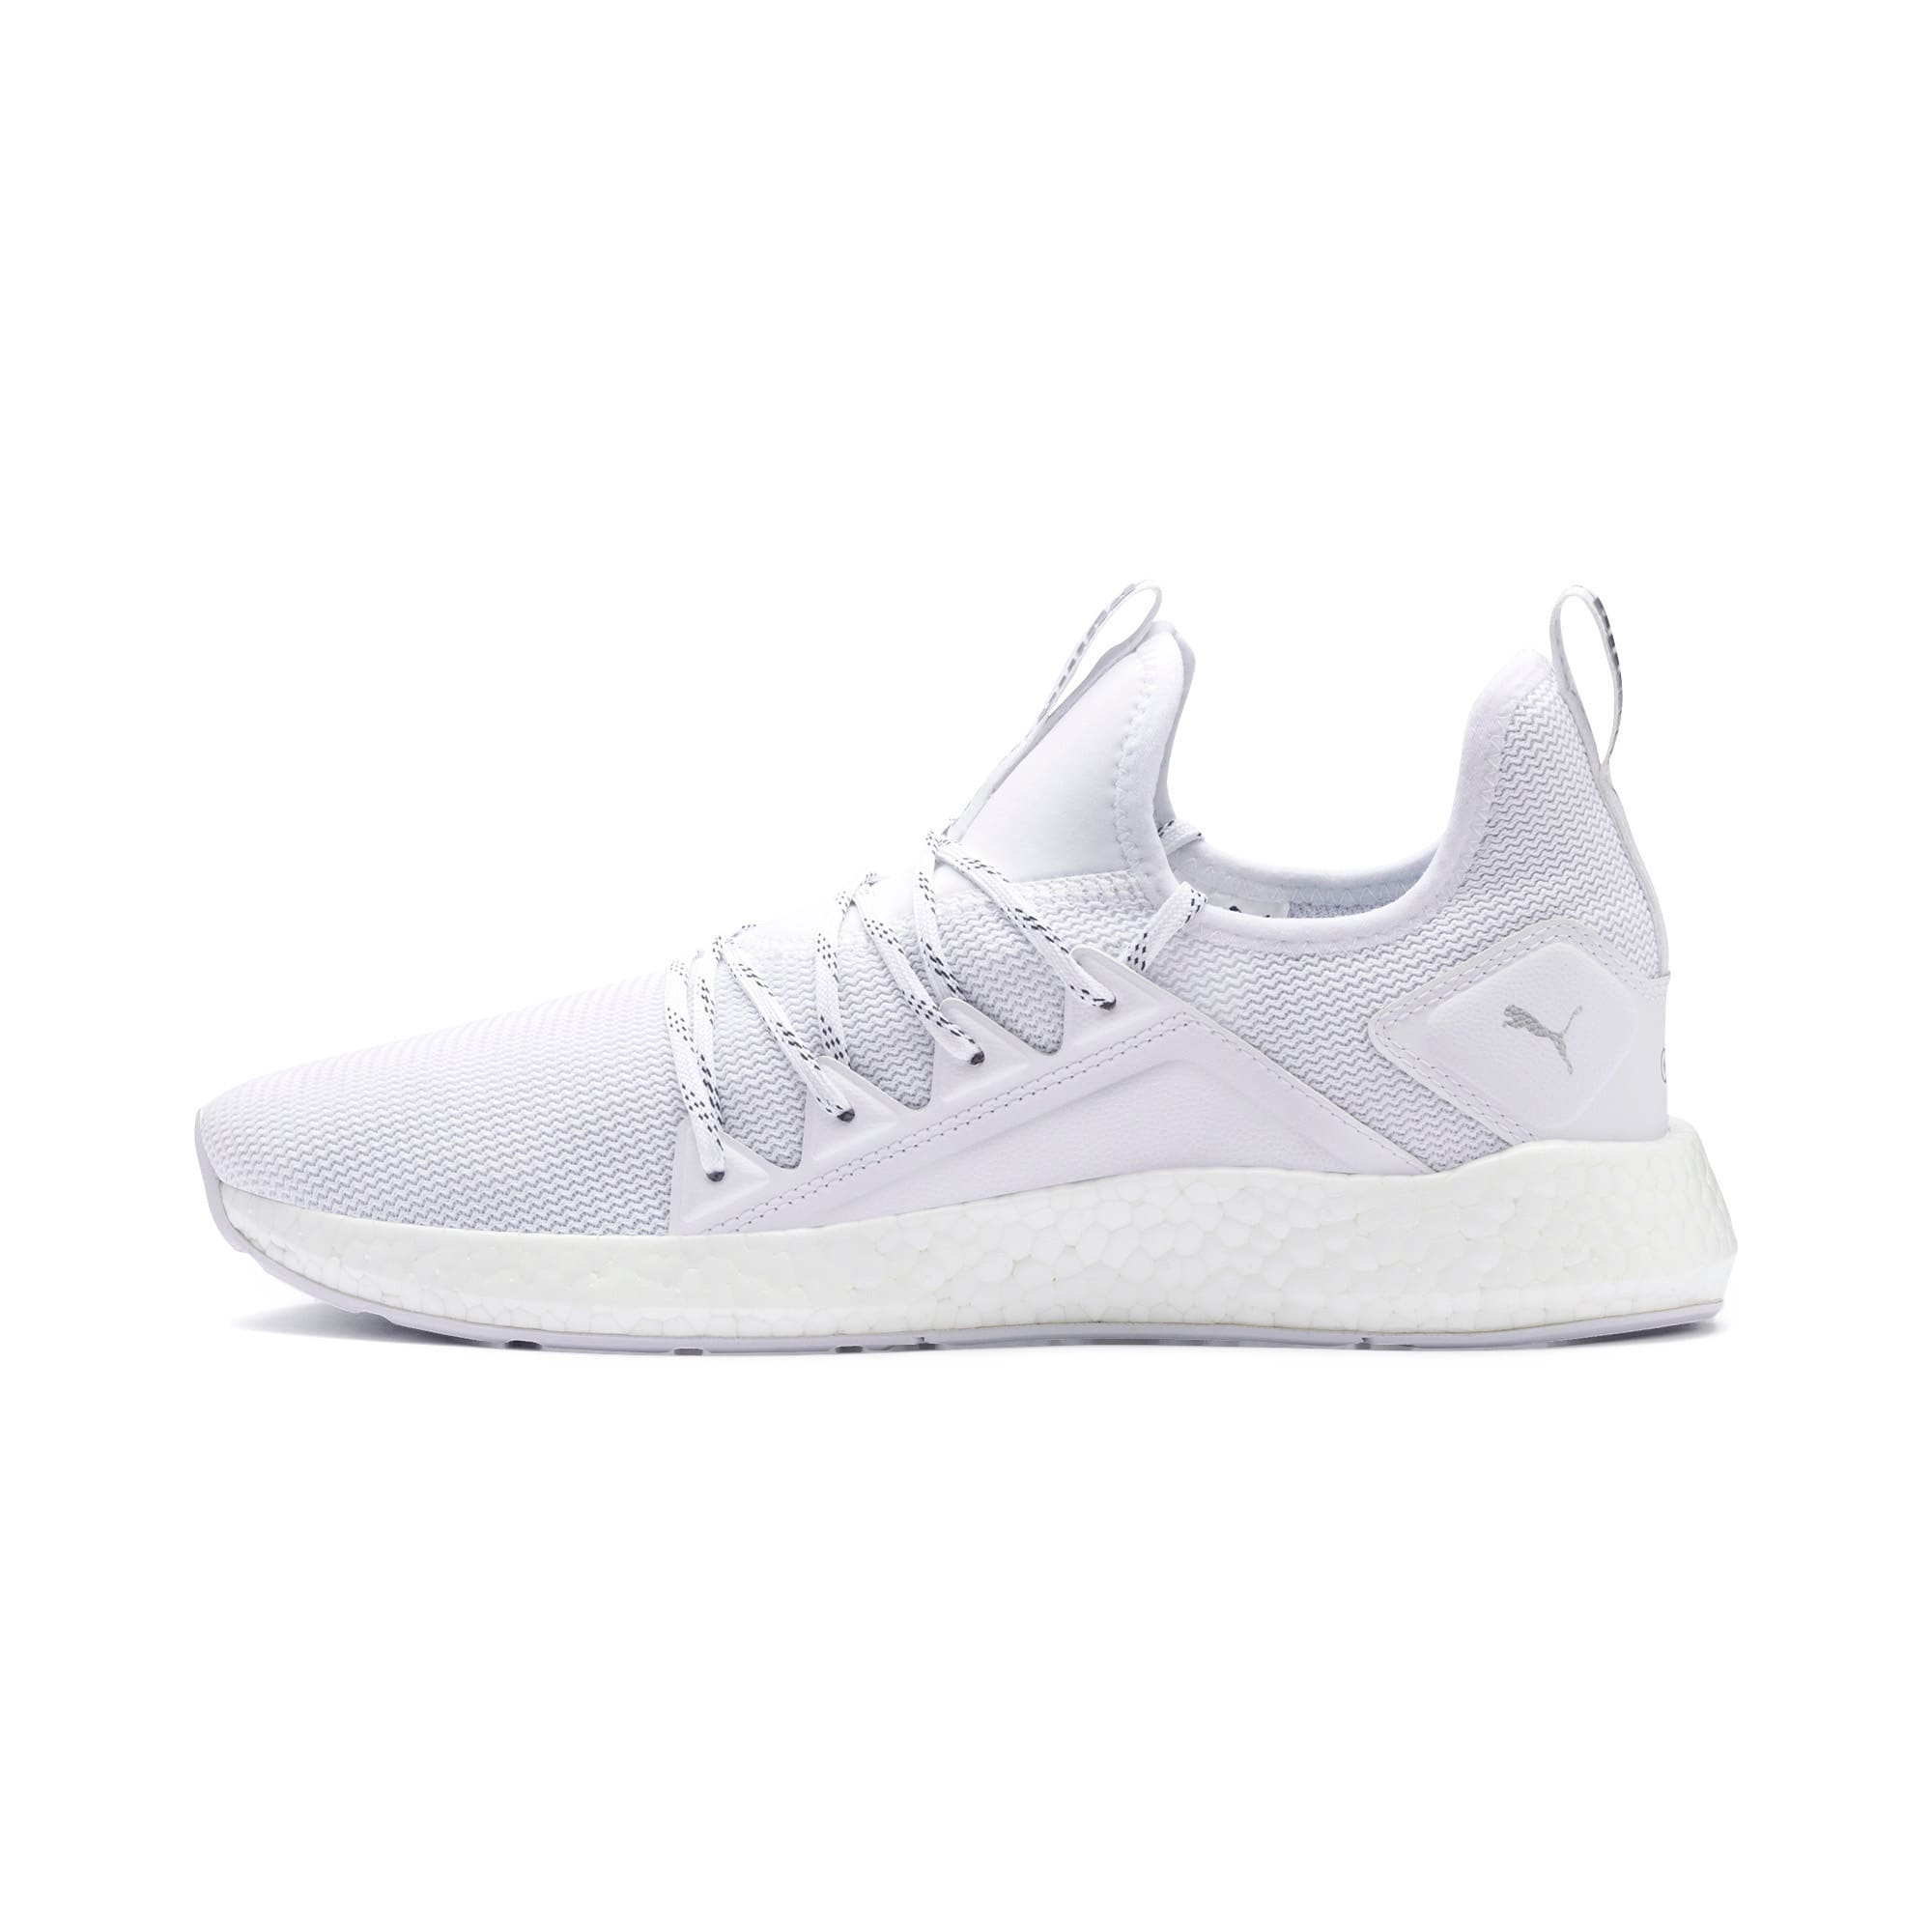 Thumbnail 1 of NRGY Neko Lights Men's Running Shoes, Puma White, medium-IND